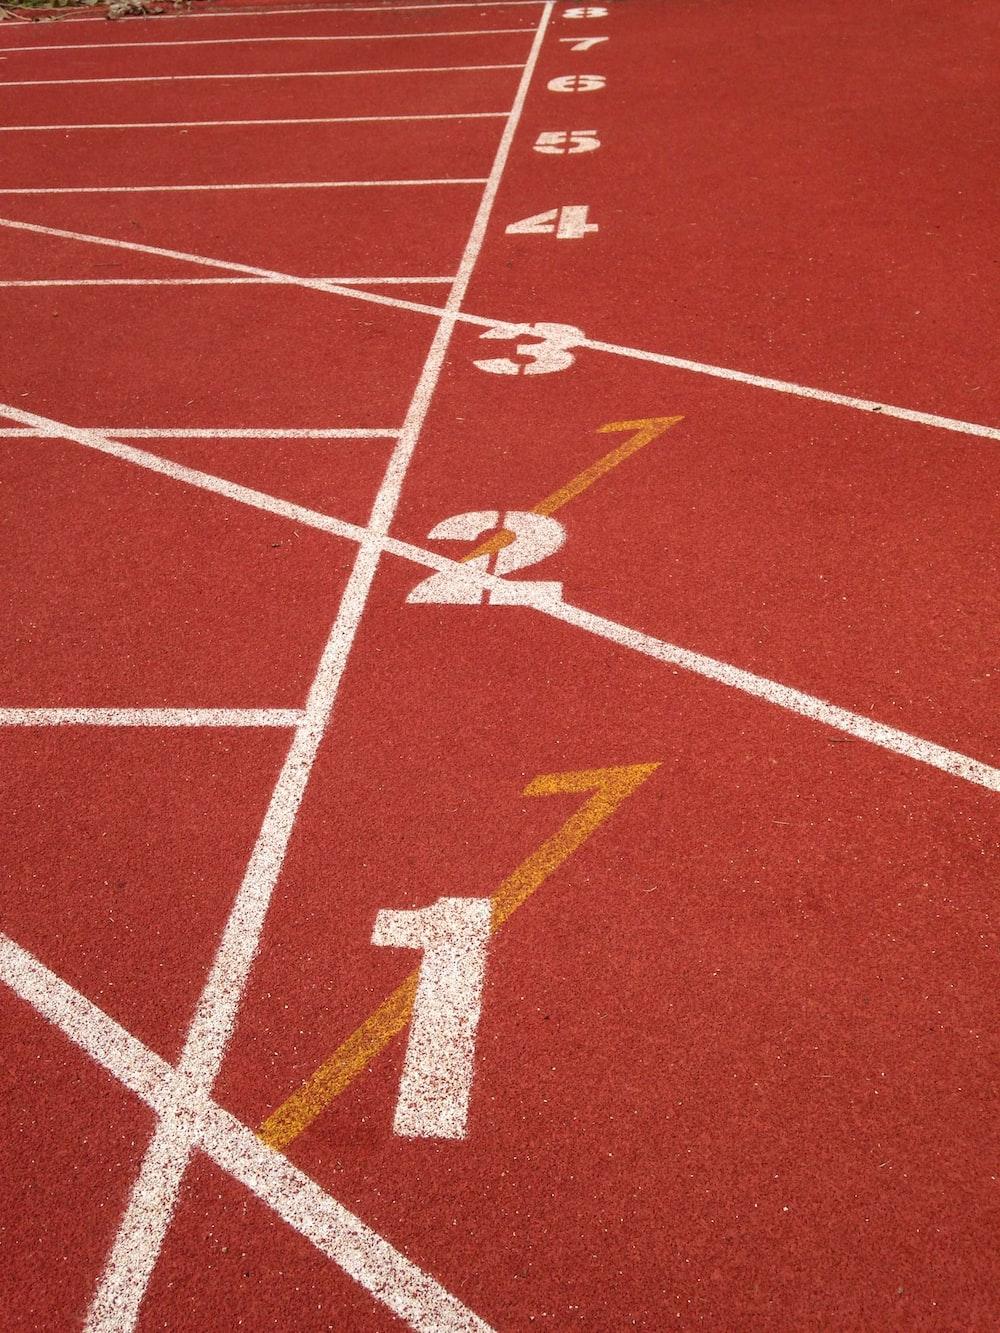 brown track field